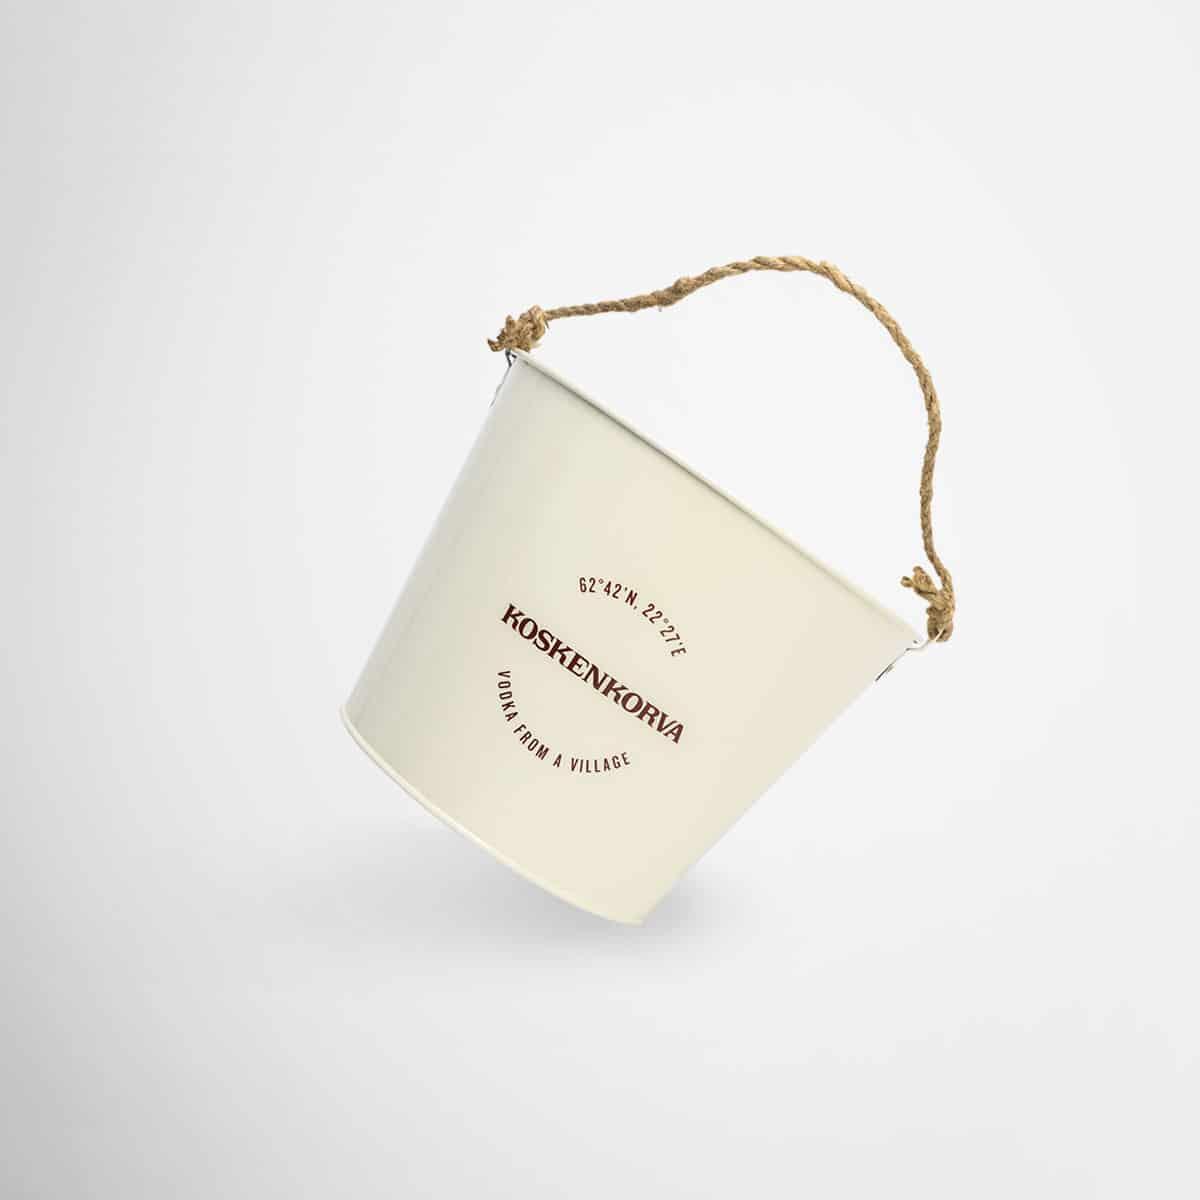 Branded Koskenkorva Bucket by Framme